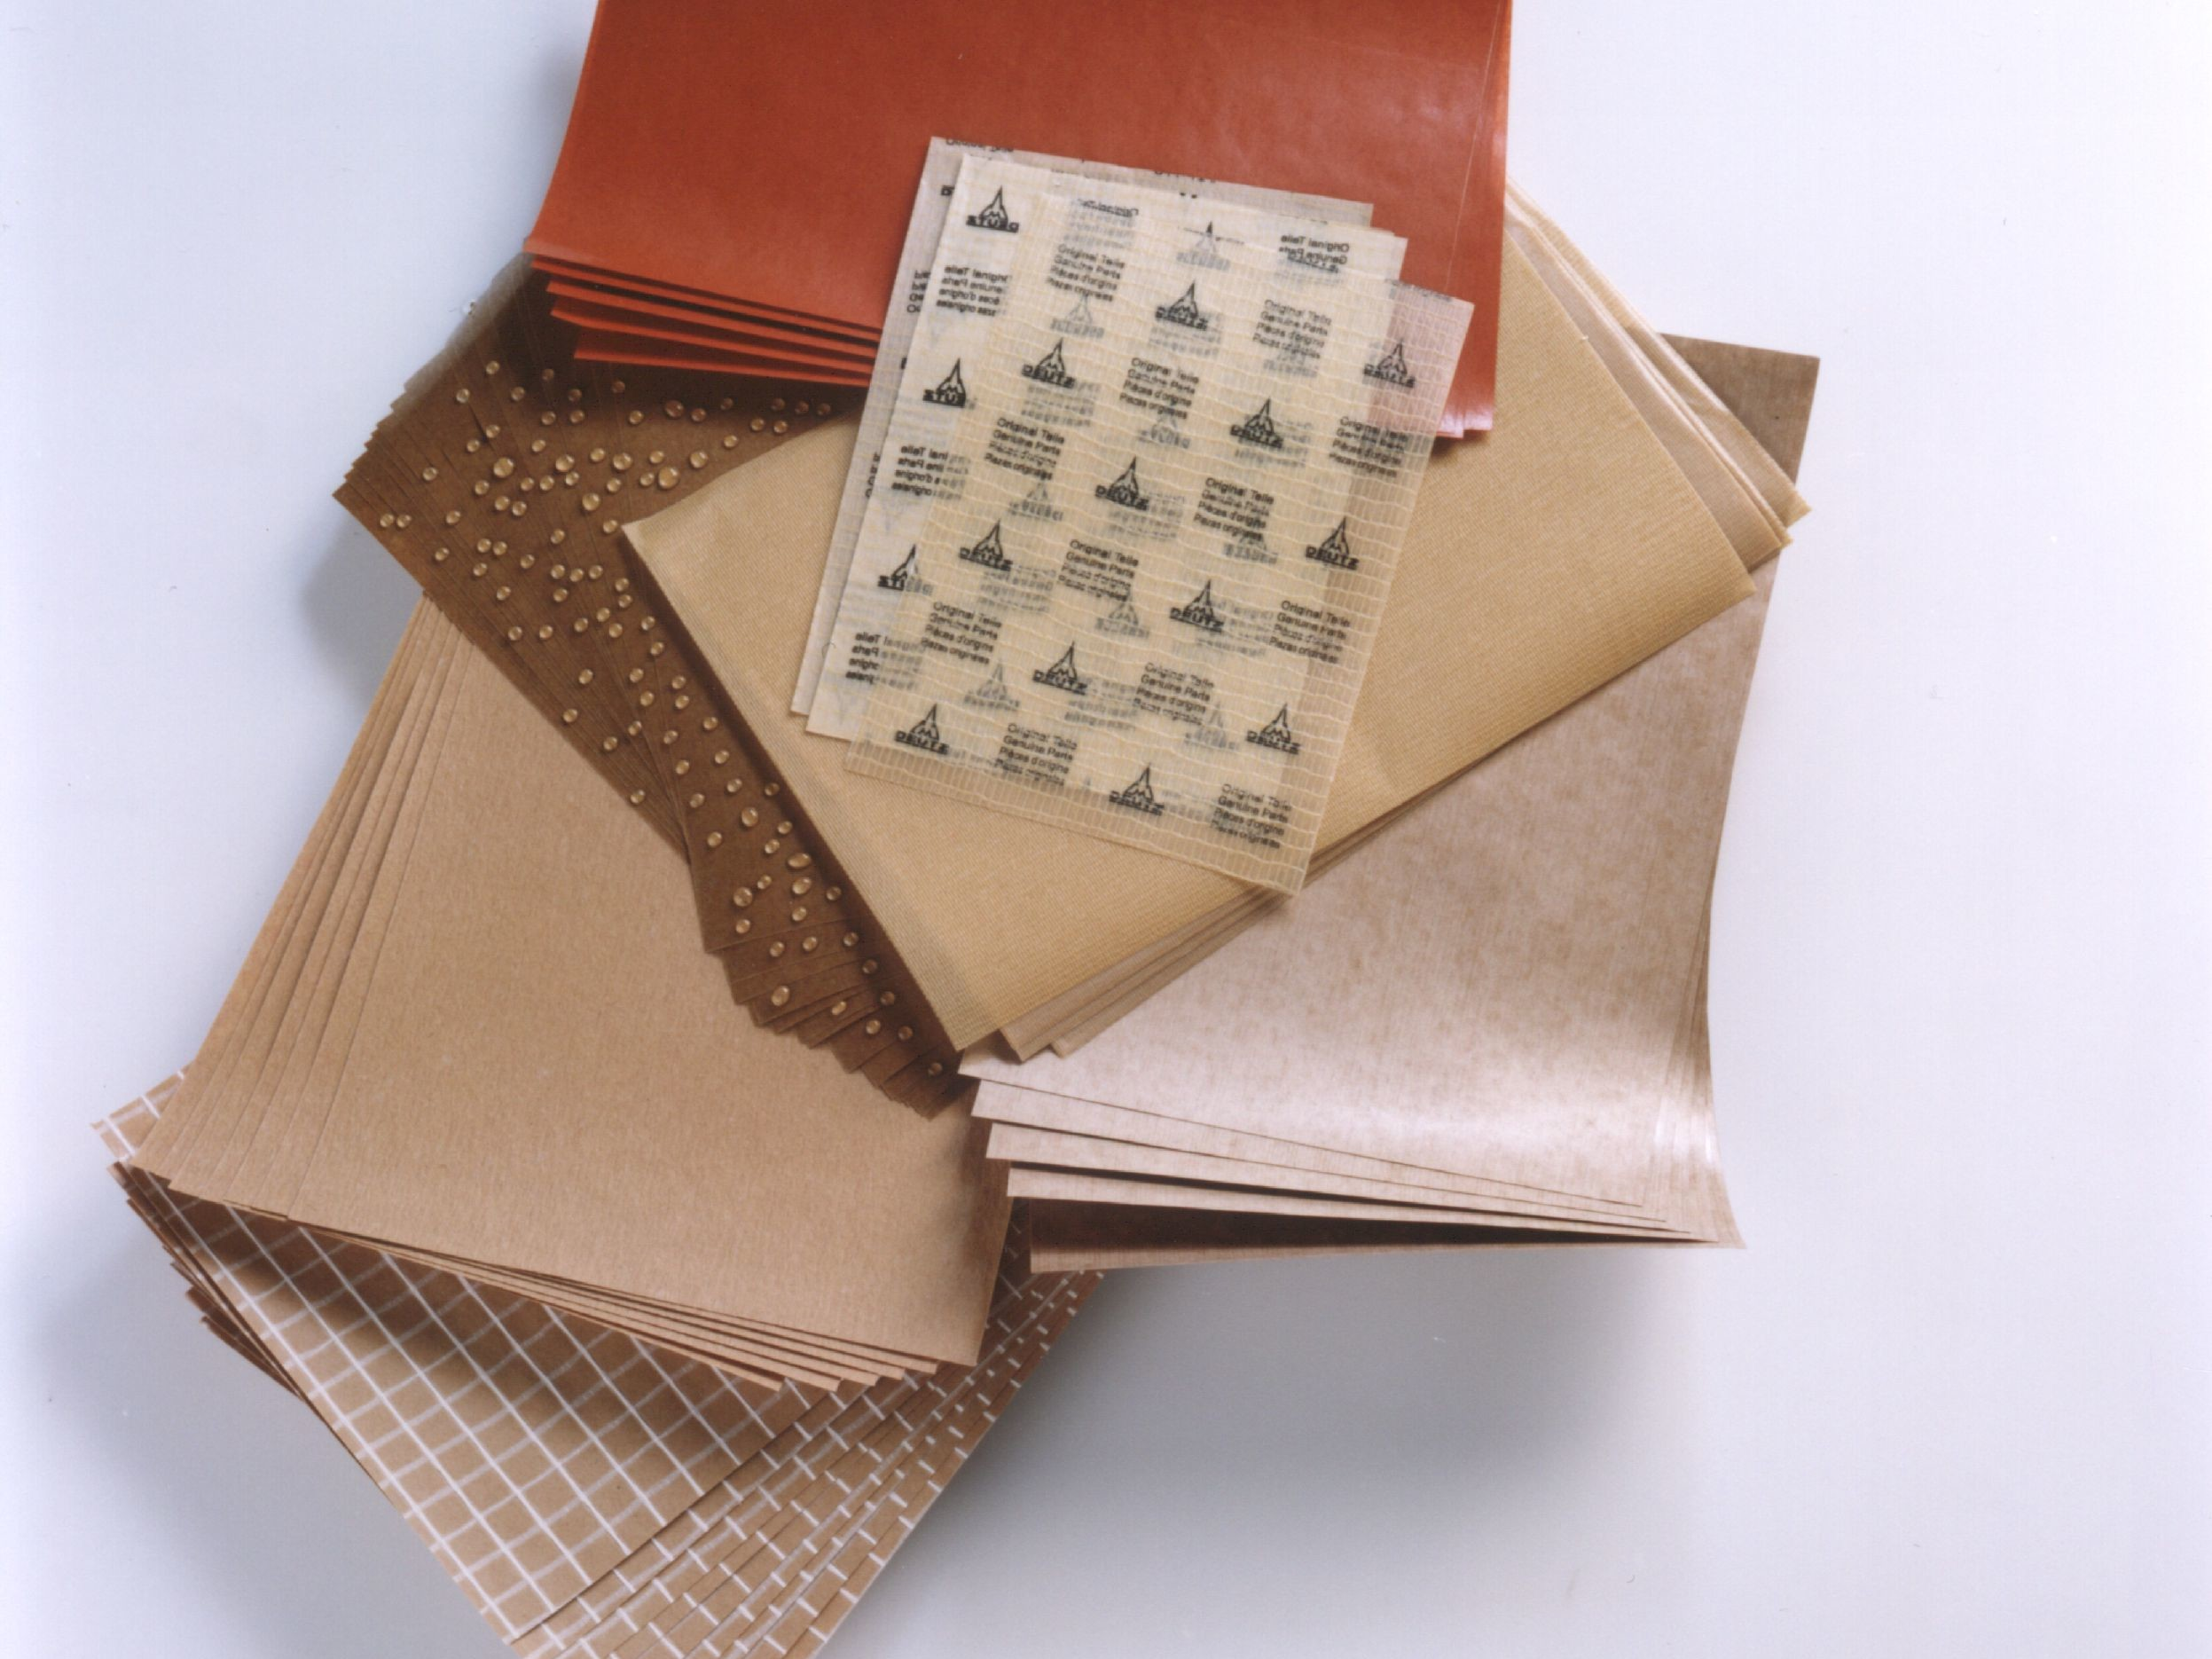 HYPERKRAFT VCI Papier Paraffinpapier C-Folie Nawrot AG Produktübersicht